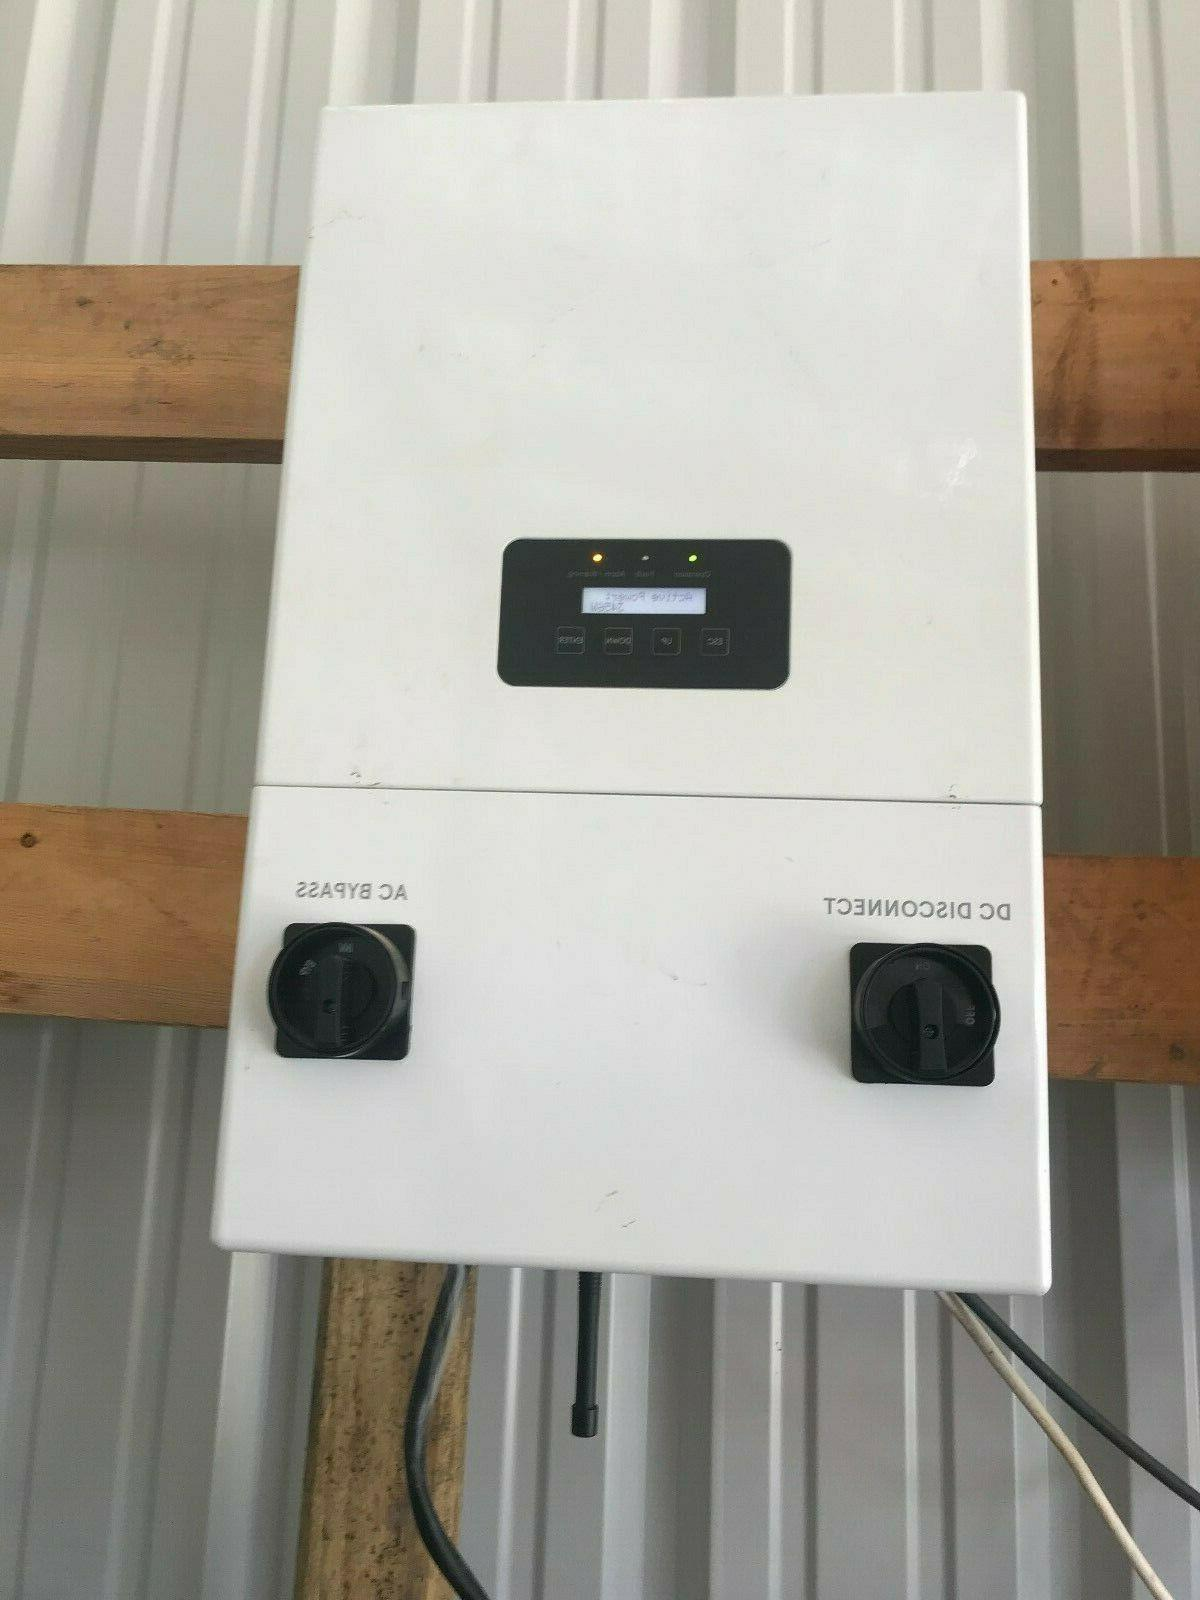 Delta H6 Grid-Tied Inverter Battery-less Backup UL1741 21 2MPPT